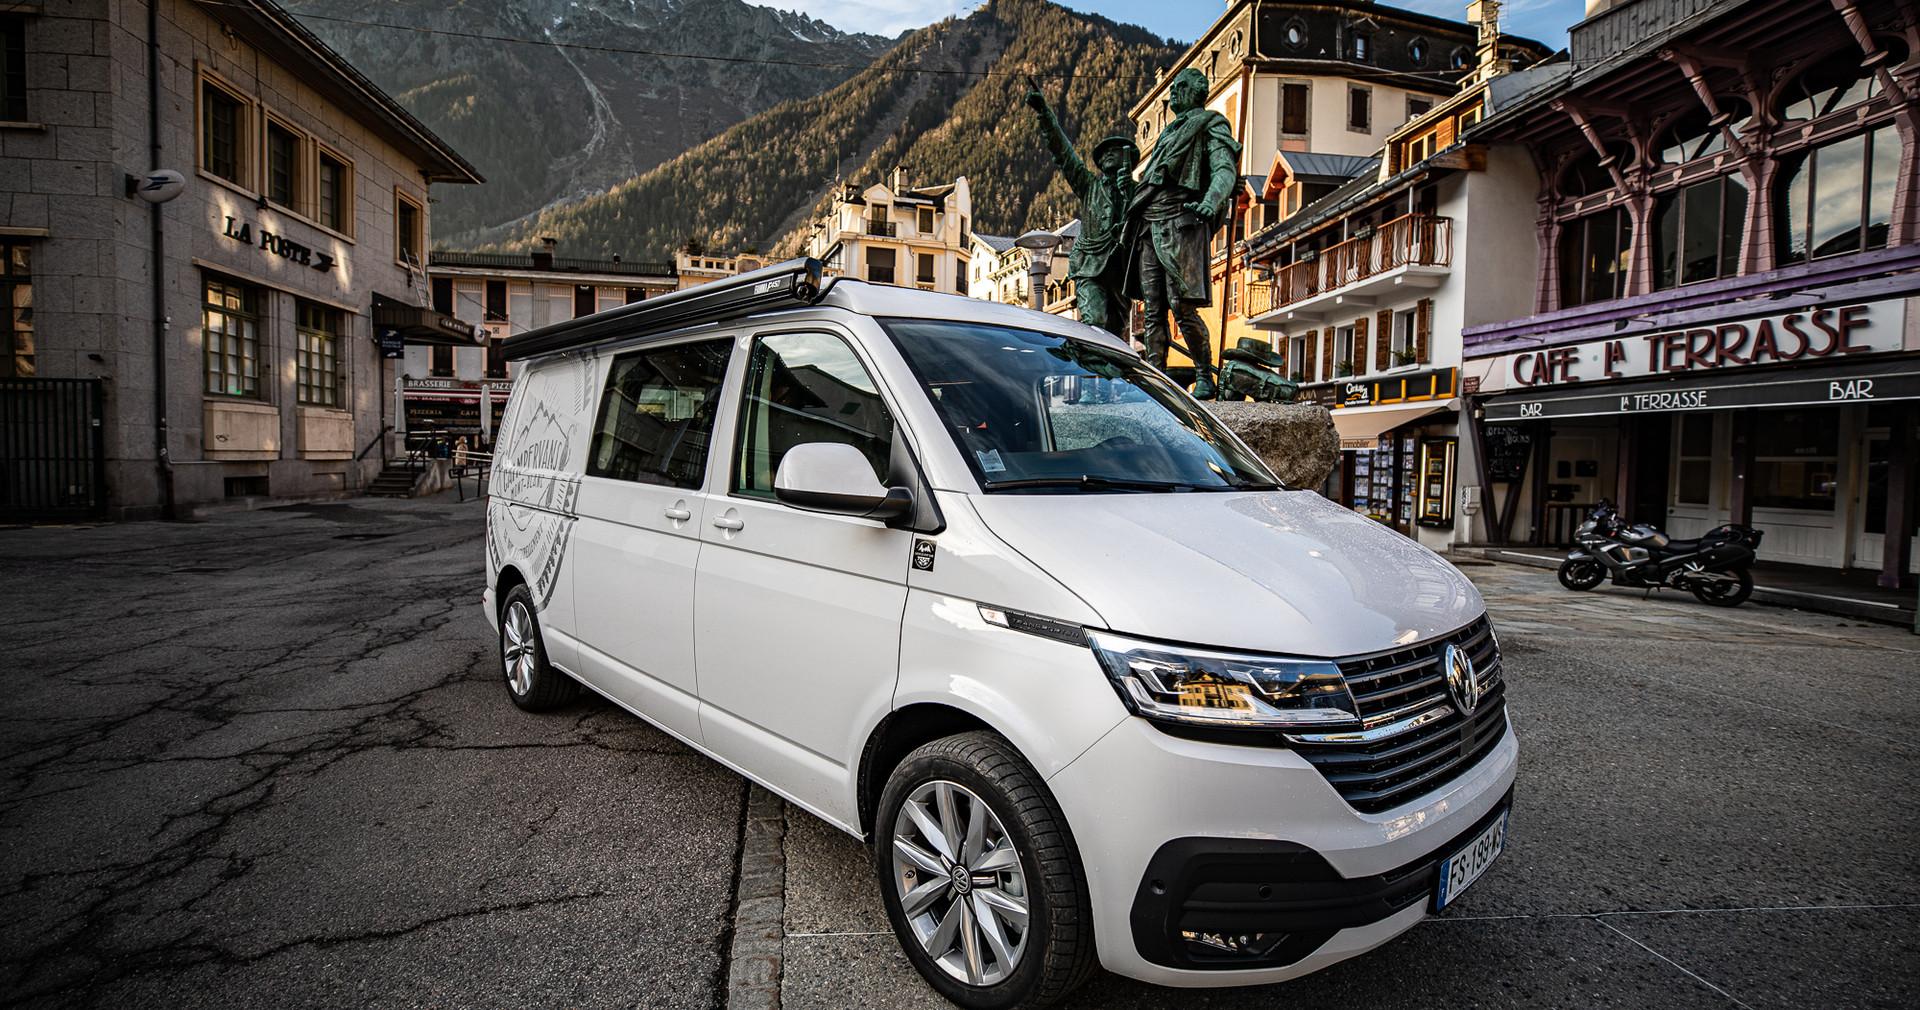 20201125_Urban van-7310-low-res-2019-2.j